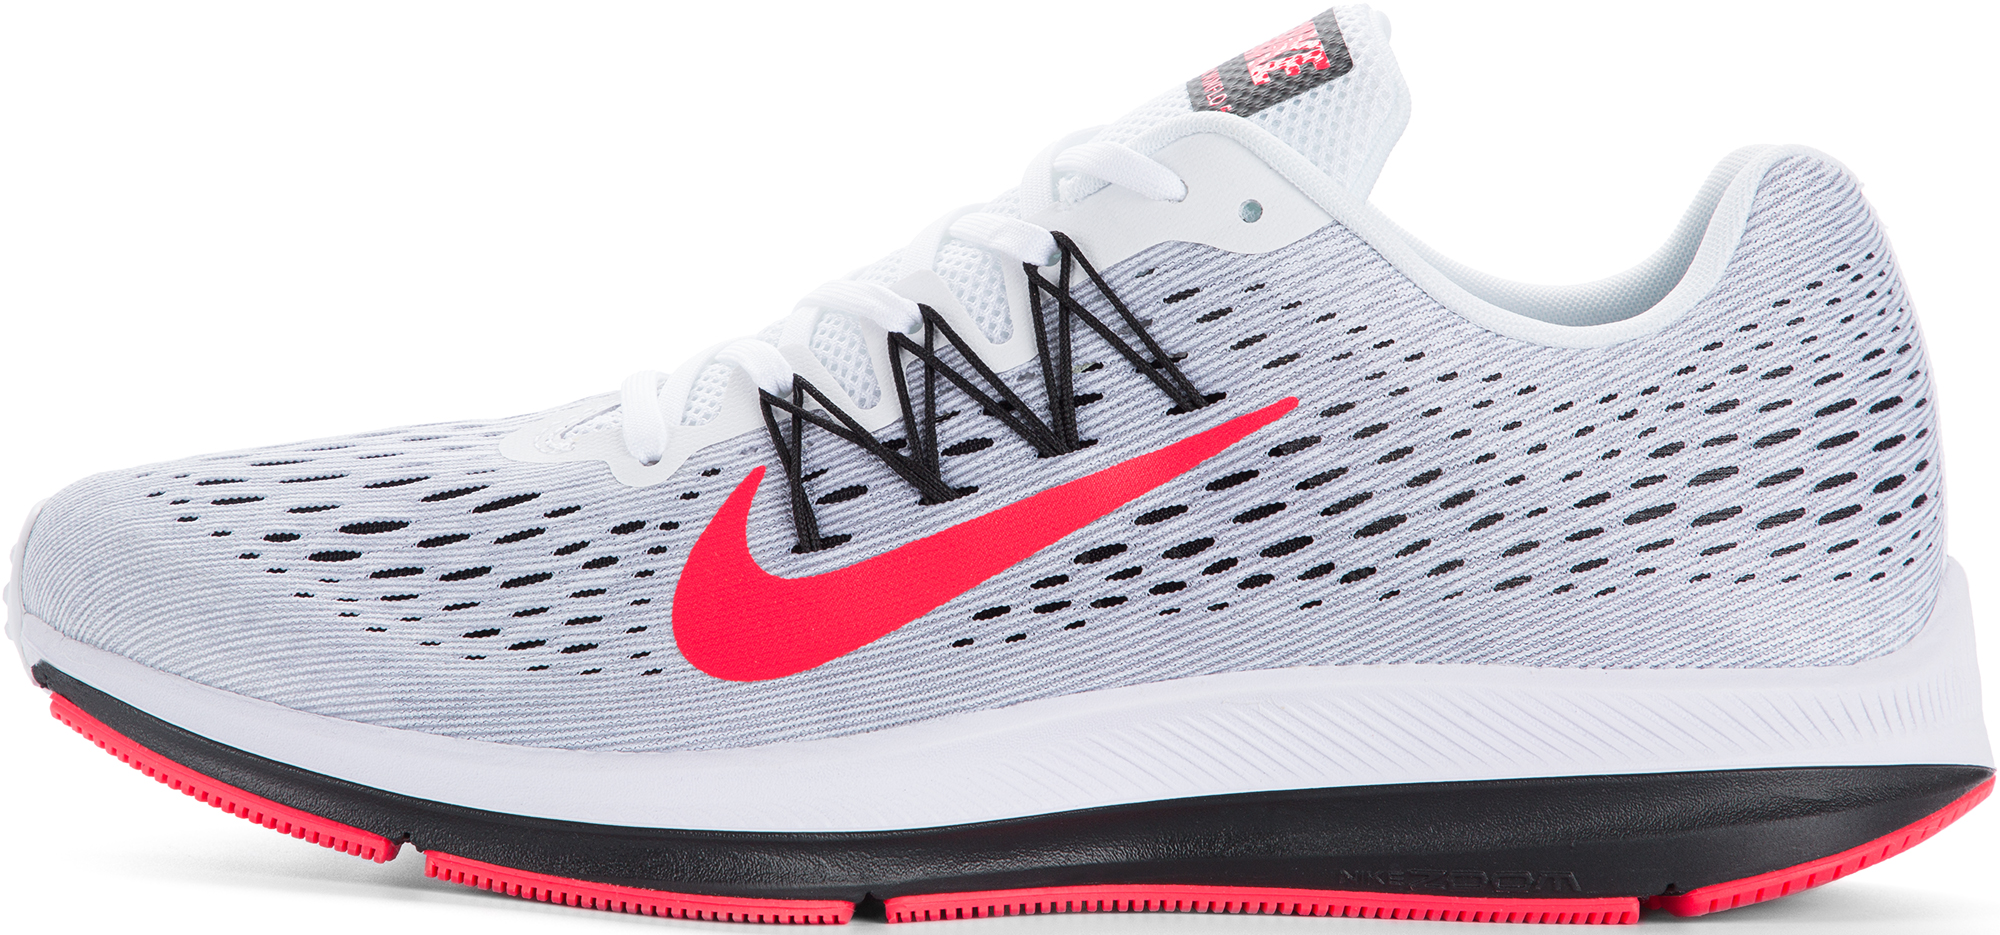 Nike Кроссовки мужские Nike Air Zoom Winflo 5, размер 44